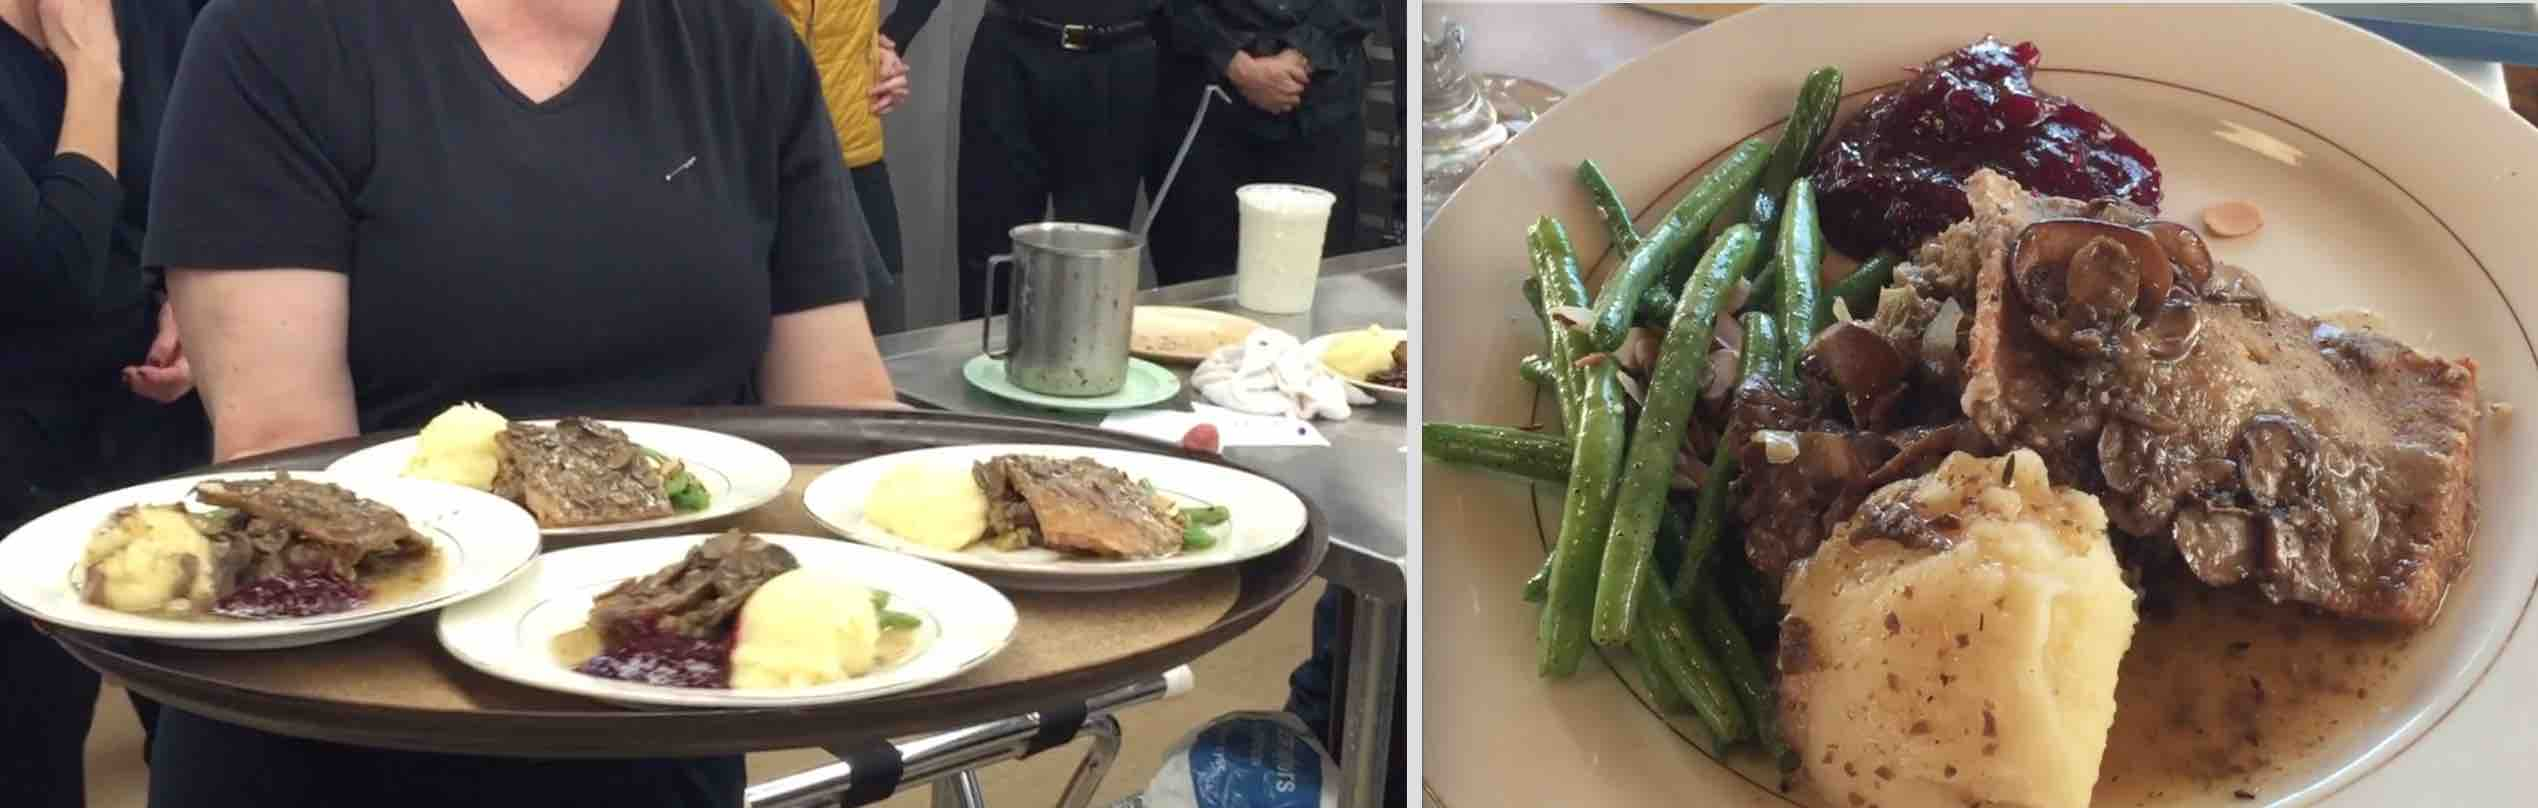 Main course: Butter roasted Blackbird seitan, Grandma Terri's classic stuffing, rosemary garlic whipped potatoes, Port shiitake mushroom gravy, lemon-sauteed green beans with almond slivers, citrus cranberry sauce